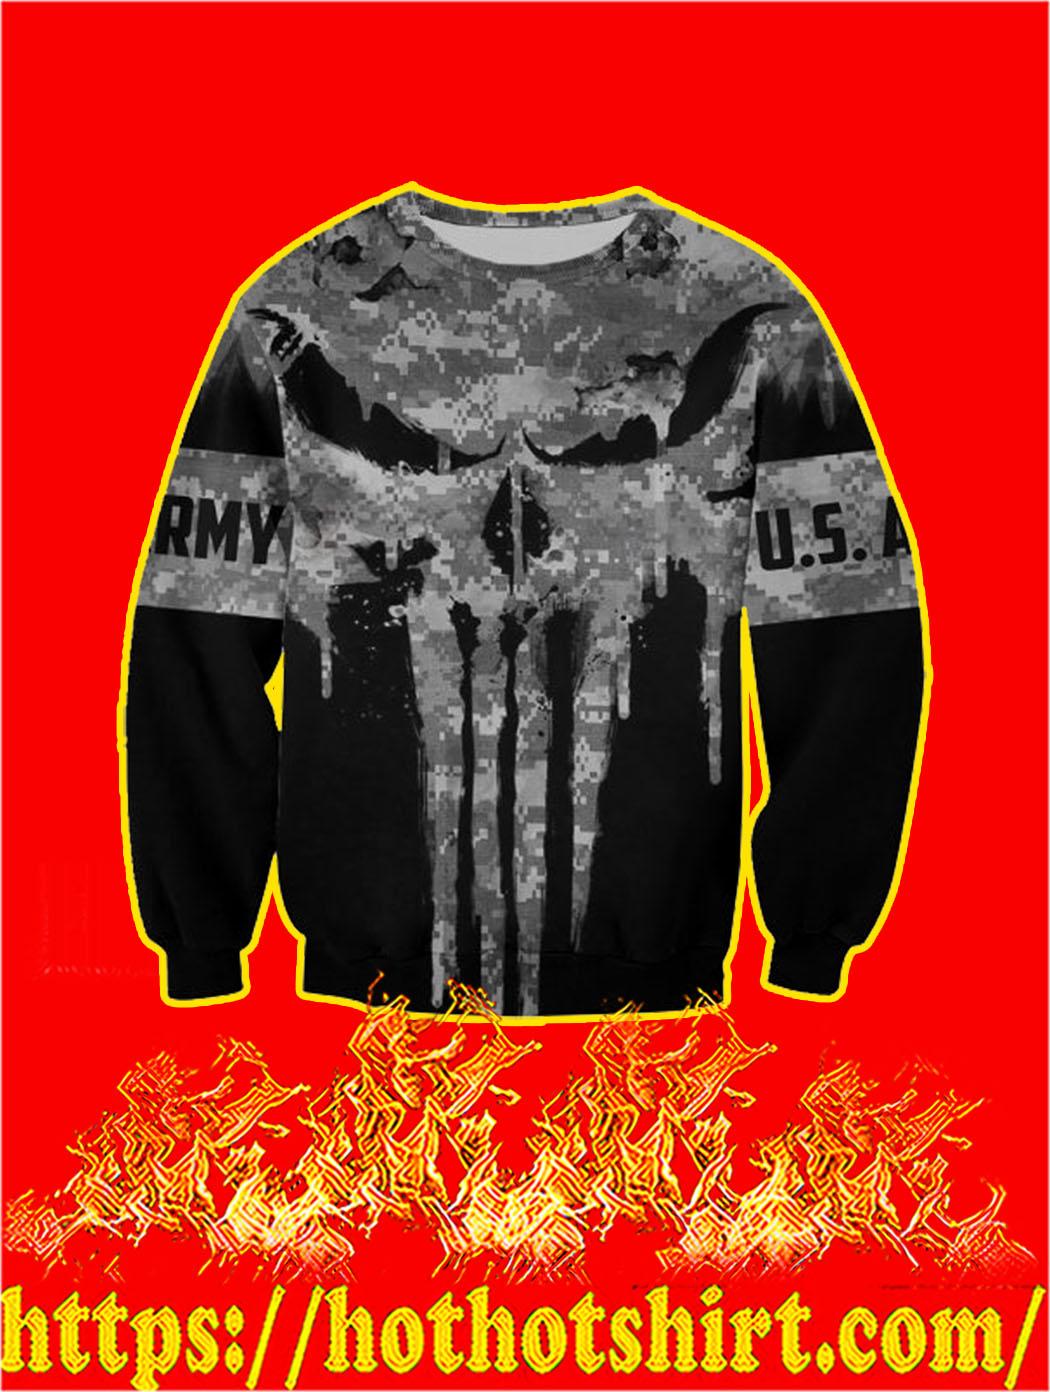 U.S Army Punisher Skull 3D Printed Sweatshirt